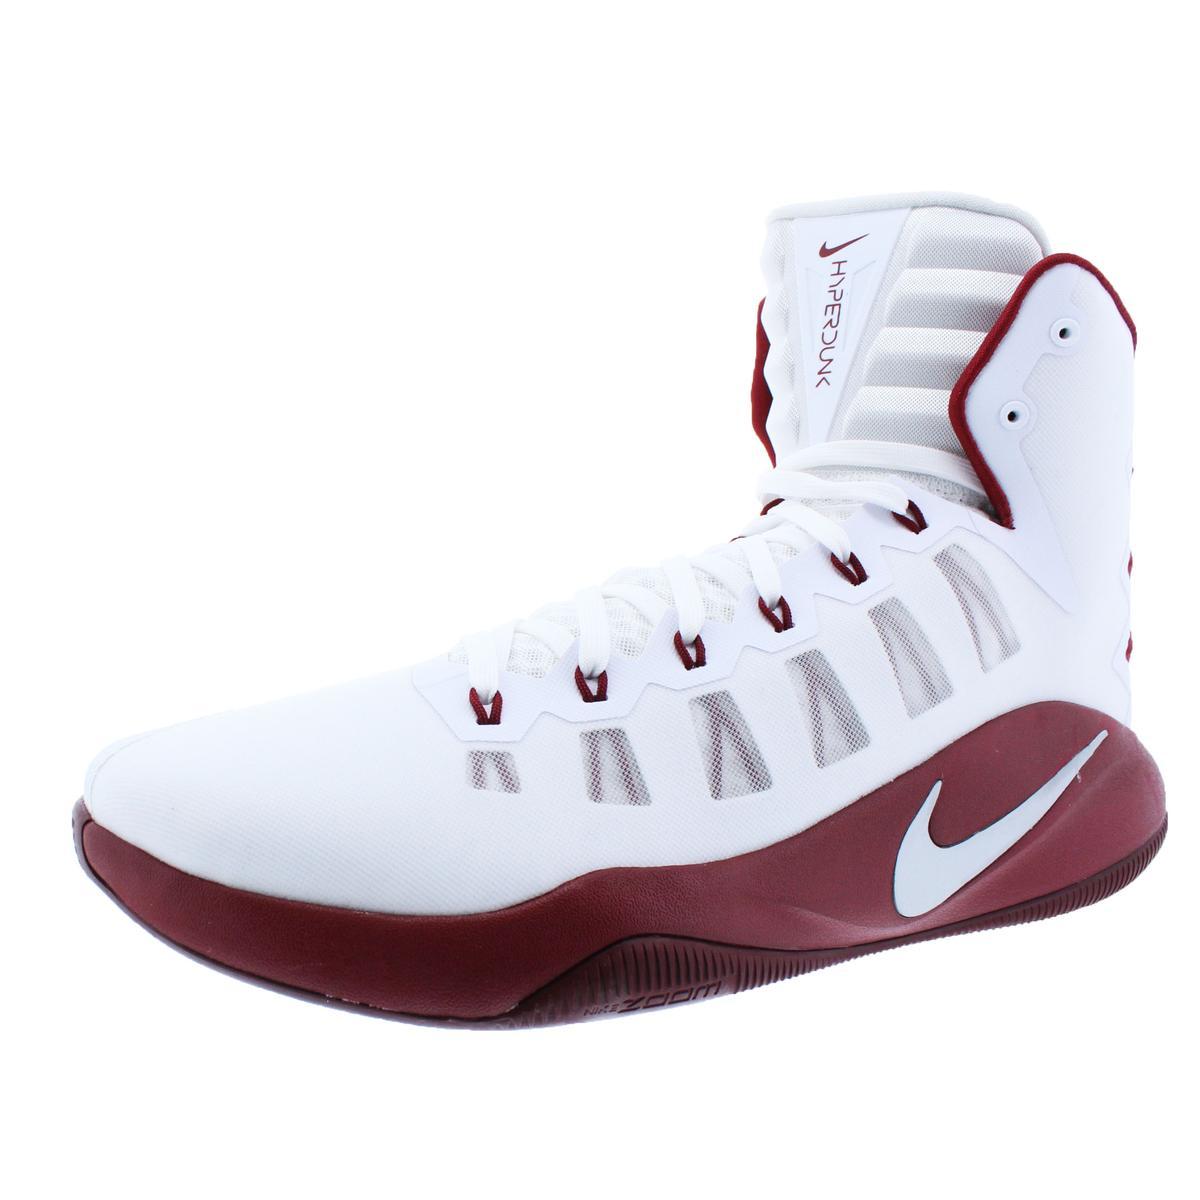 888a18d2dfd Nike Mens Hyperdunk 2016 TB Promo Red Basketball Shoes 18 Medium (D ...